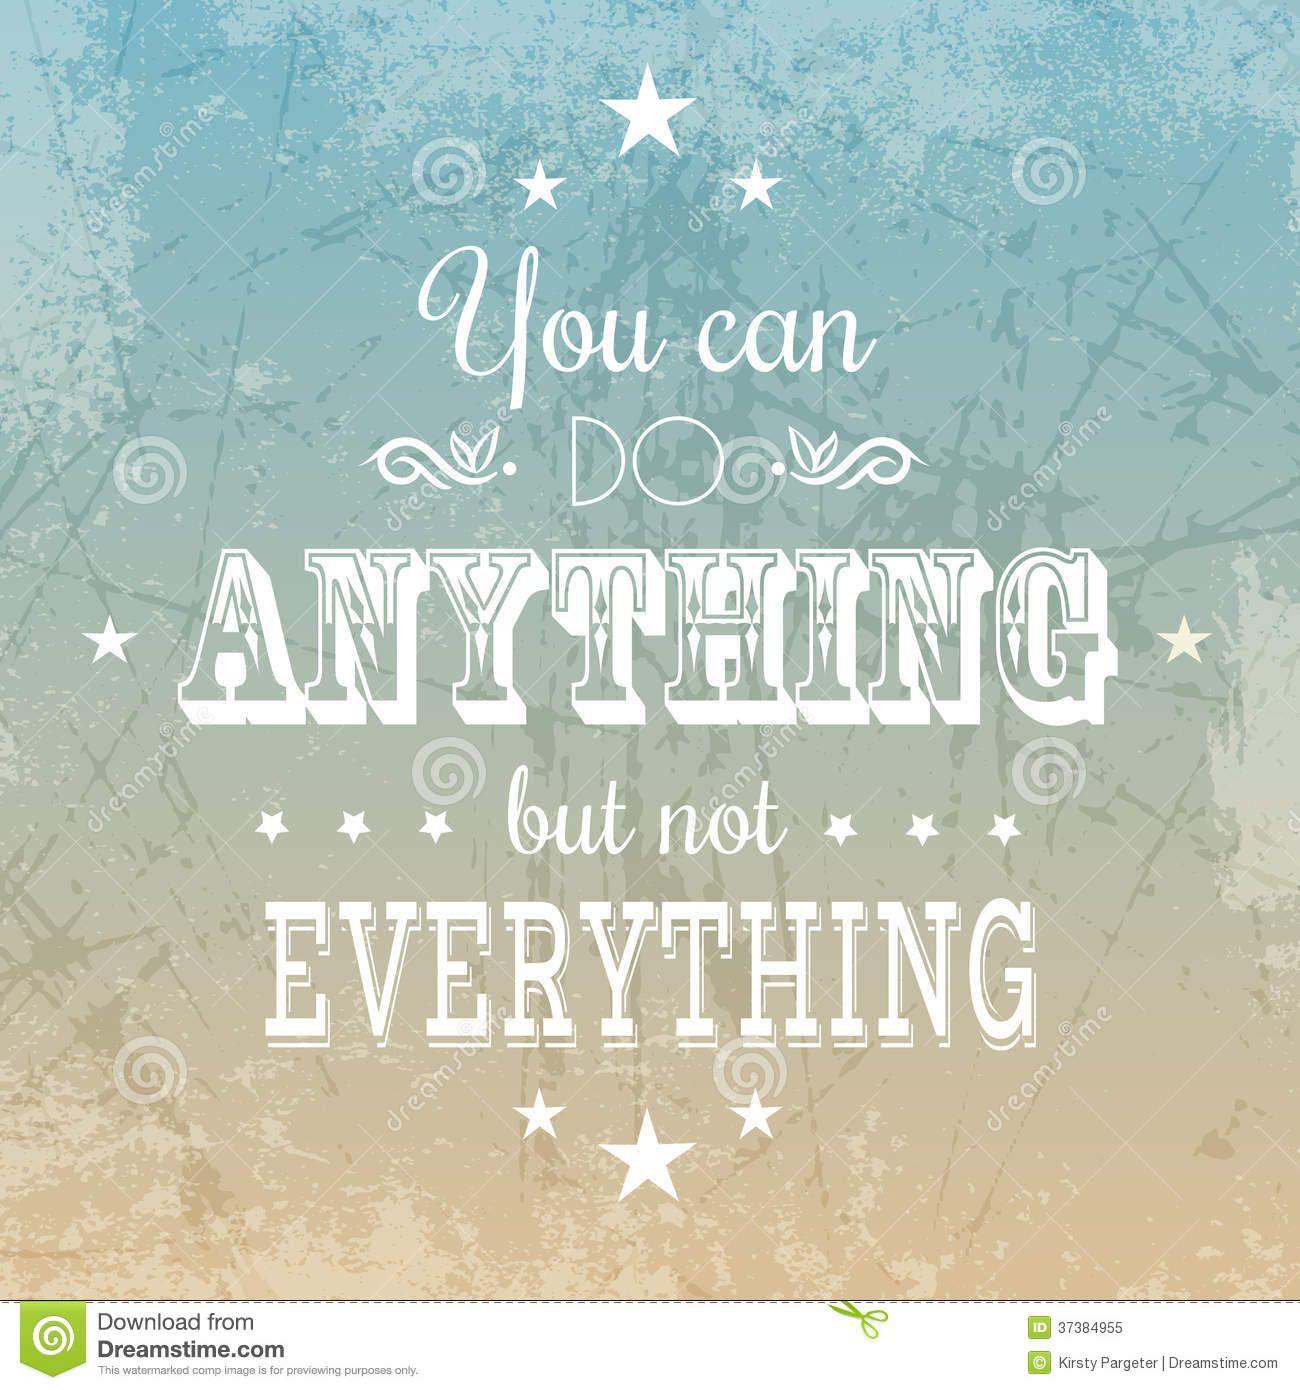 Copyright Free Inspirational Quotes Quotesgram Free